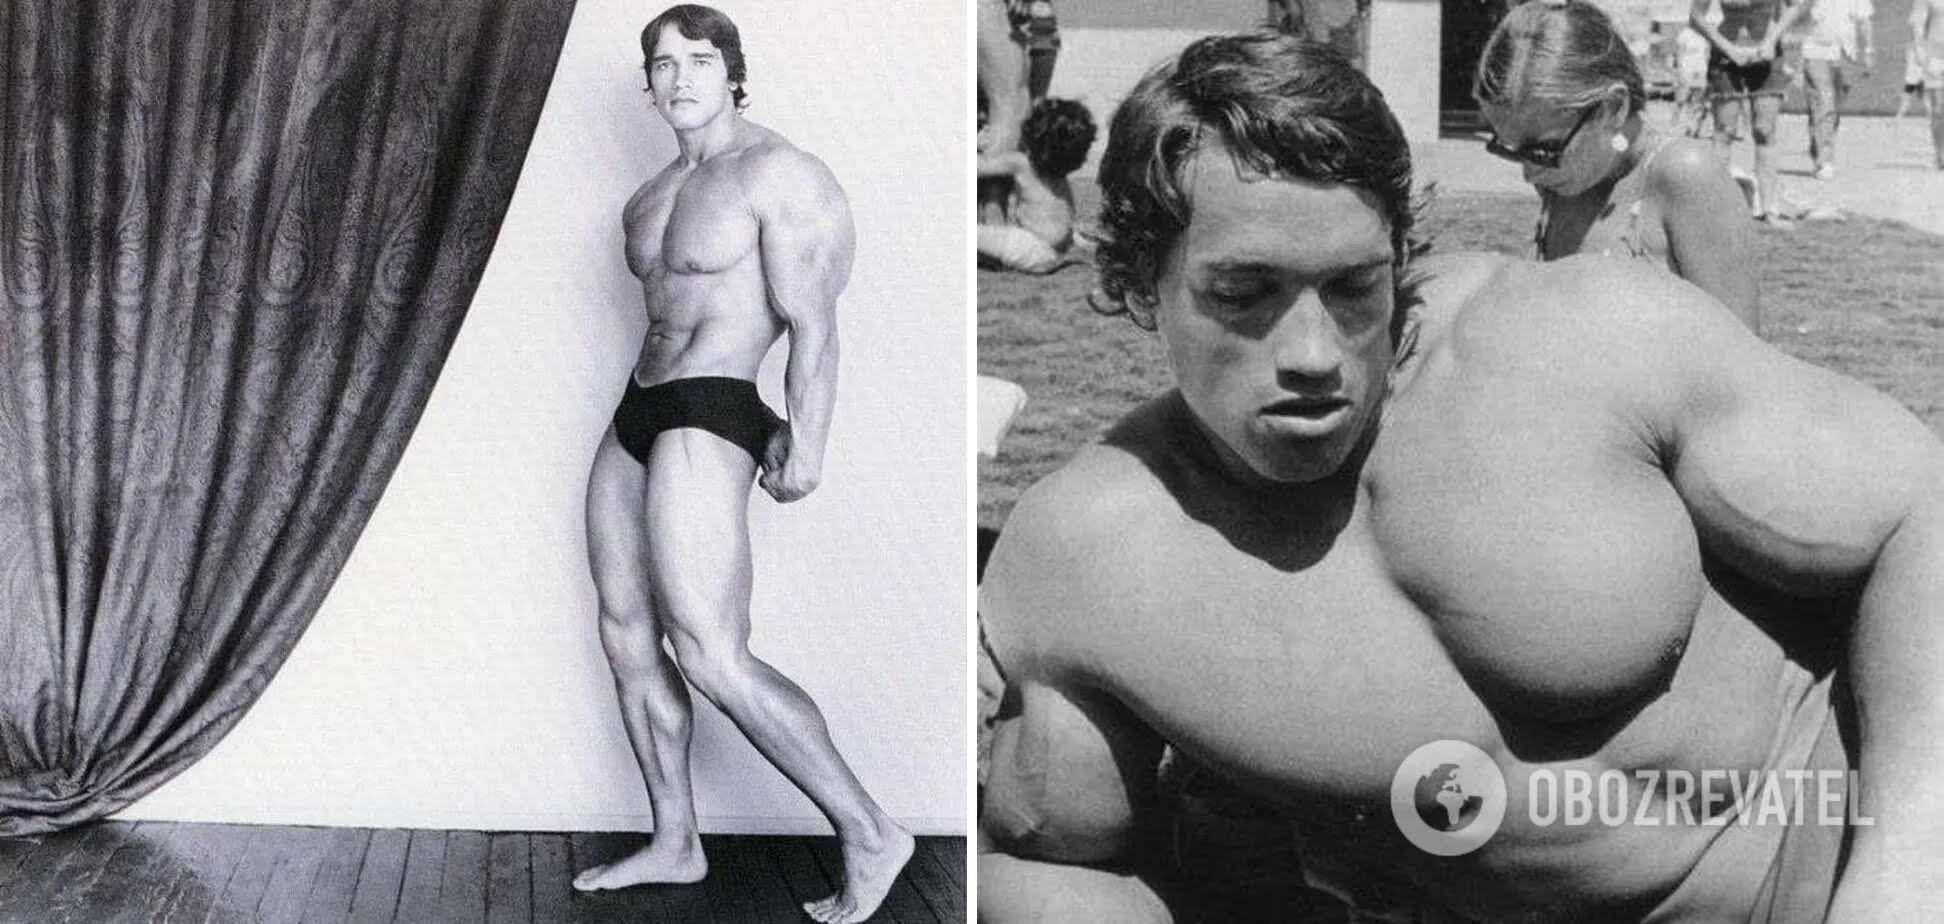 Тяжелая атлетика подарила Шварценеггеру такую потрясающую форму.